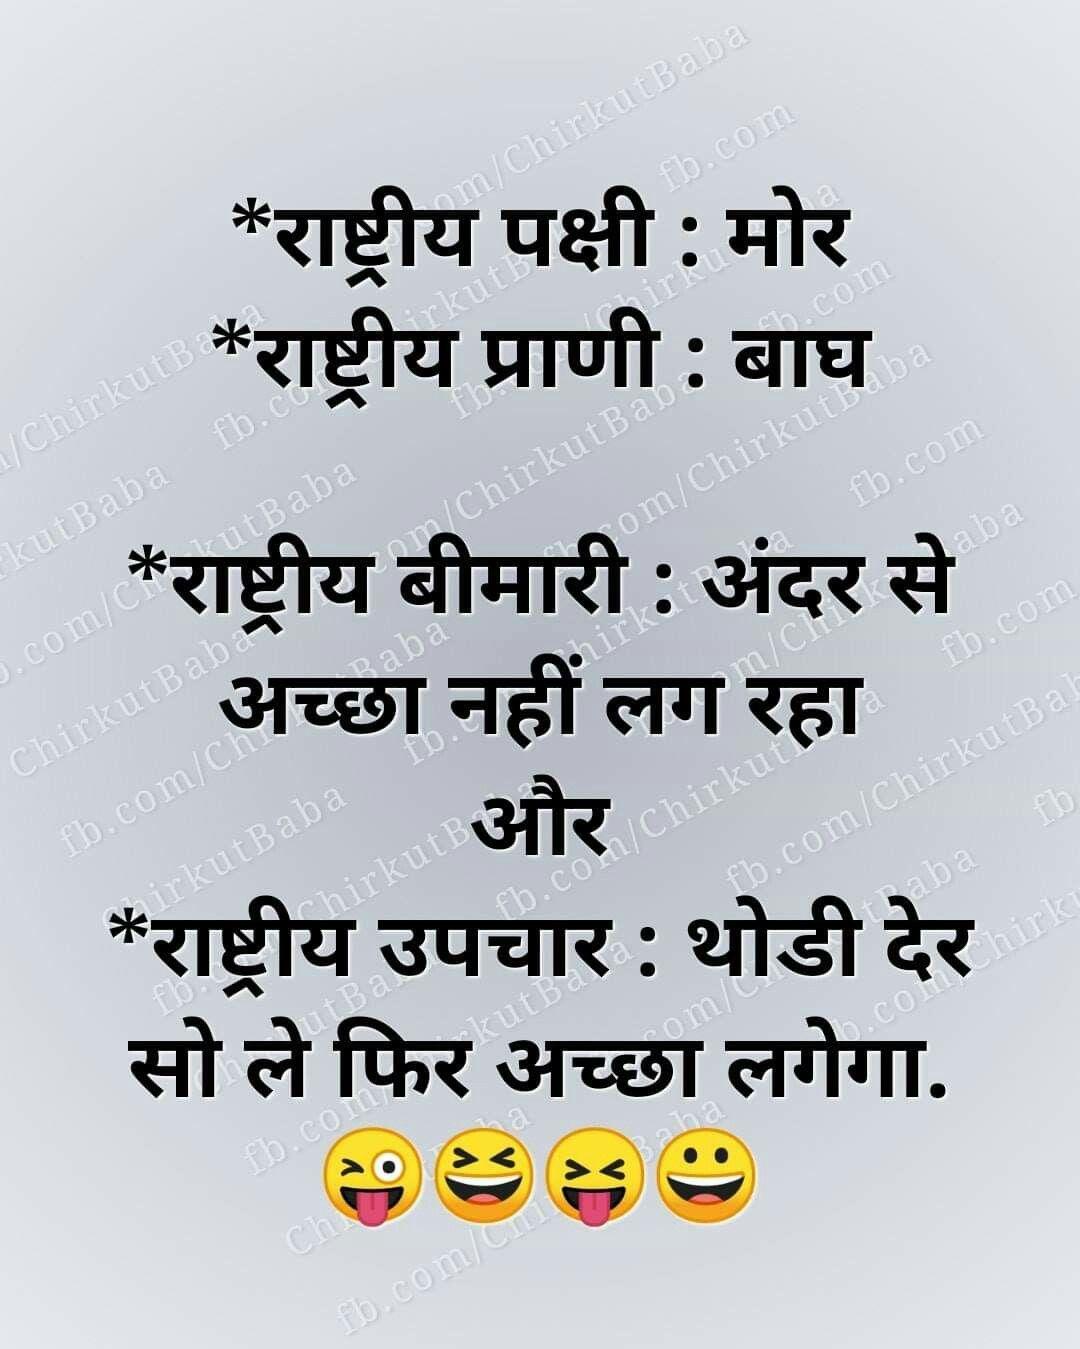 Hindi Joke Funny Jokes In Hindi Funny Quotes In Hindi Jokes Quotes